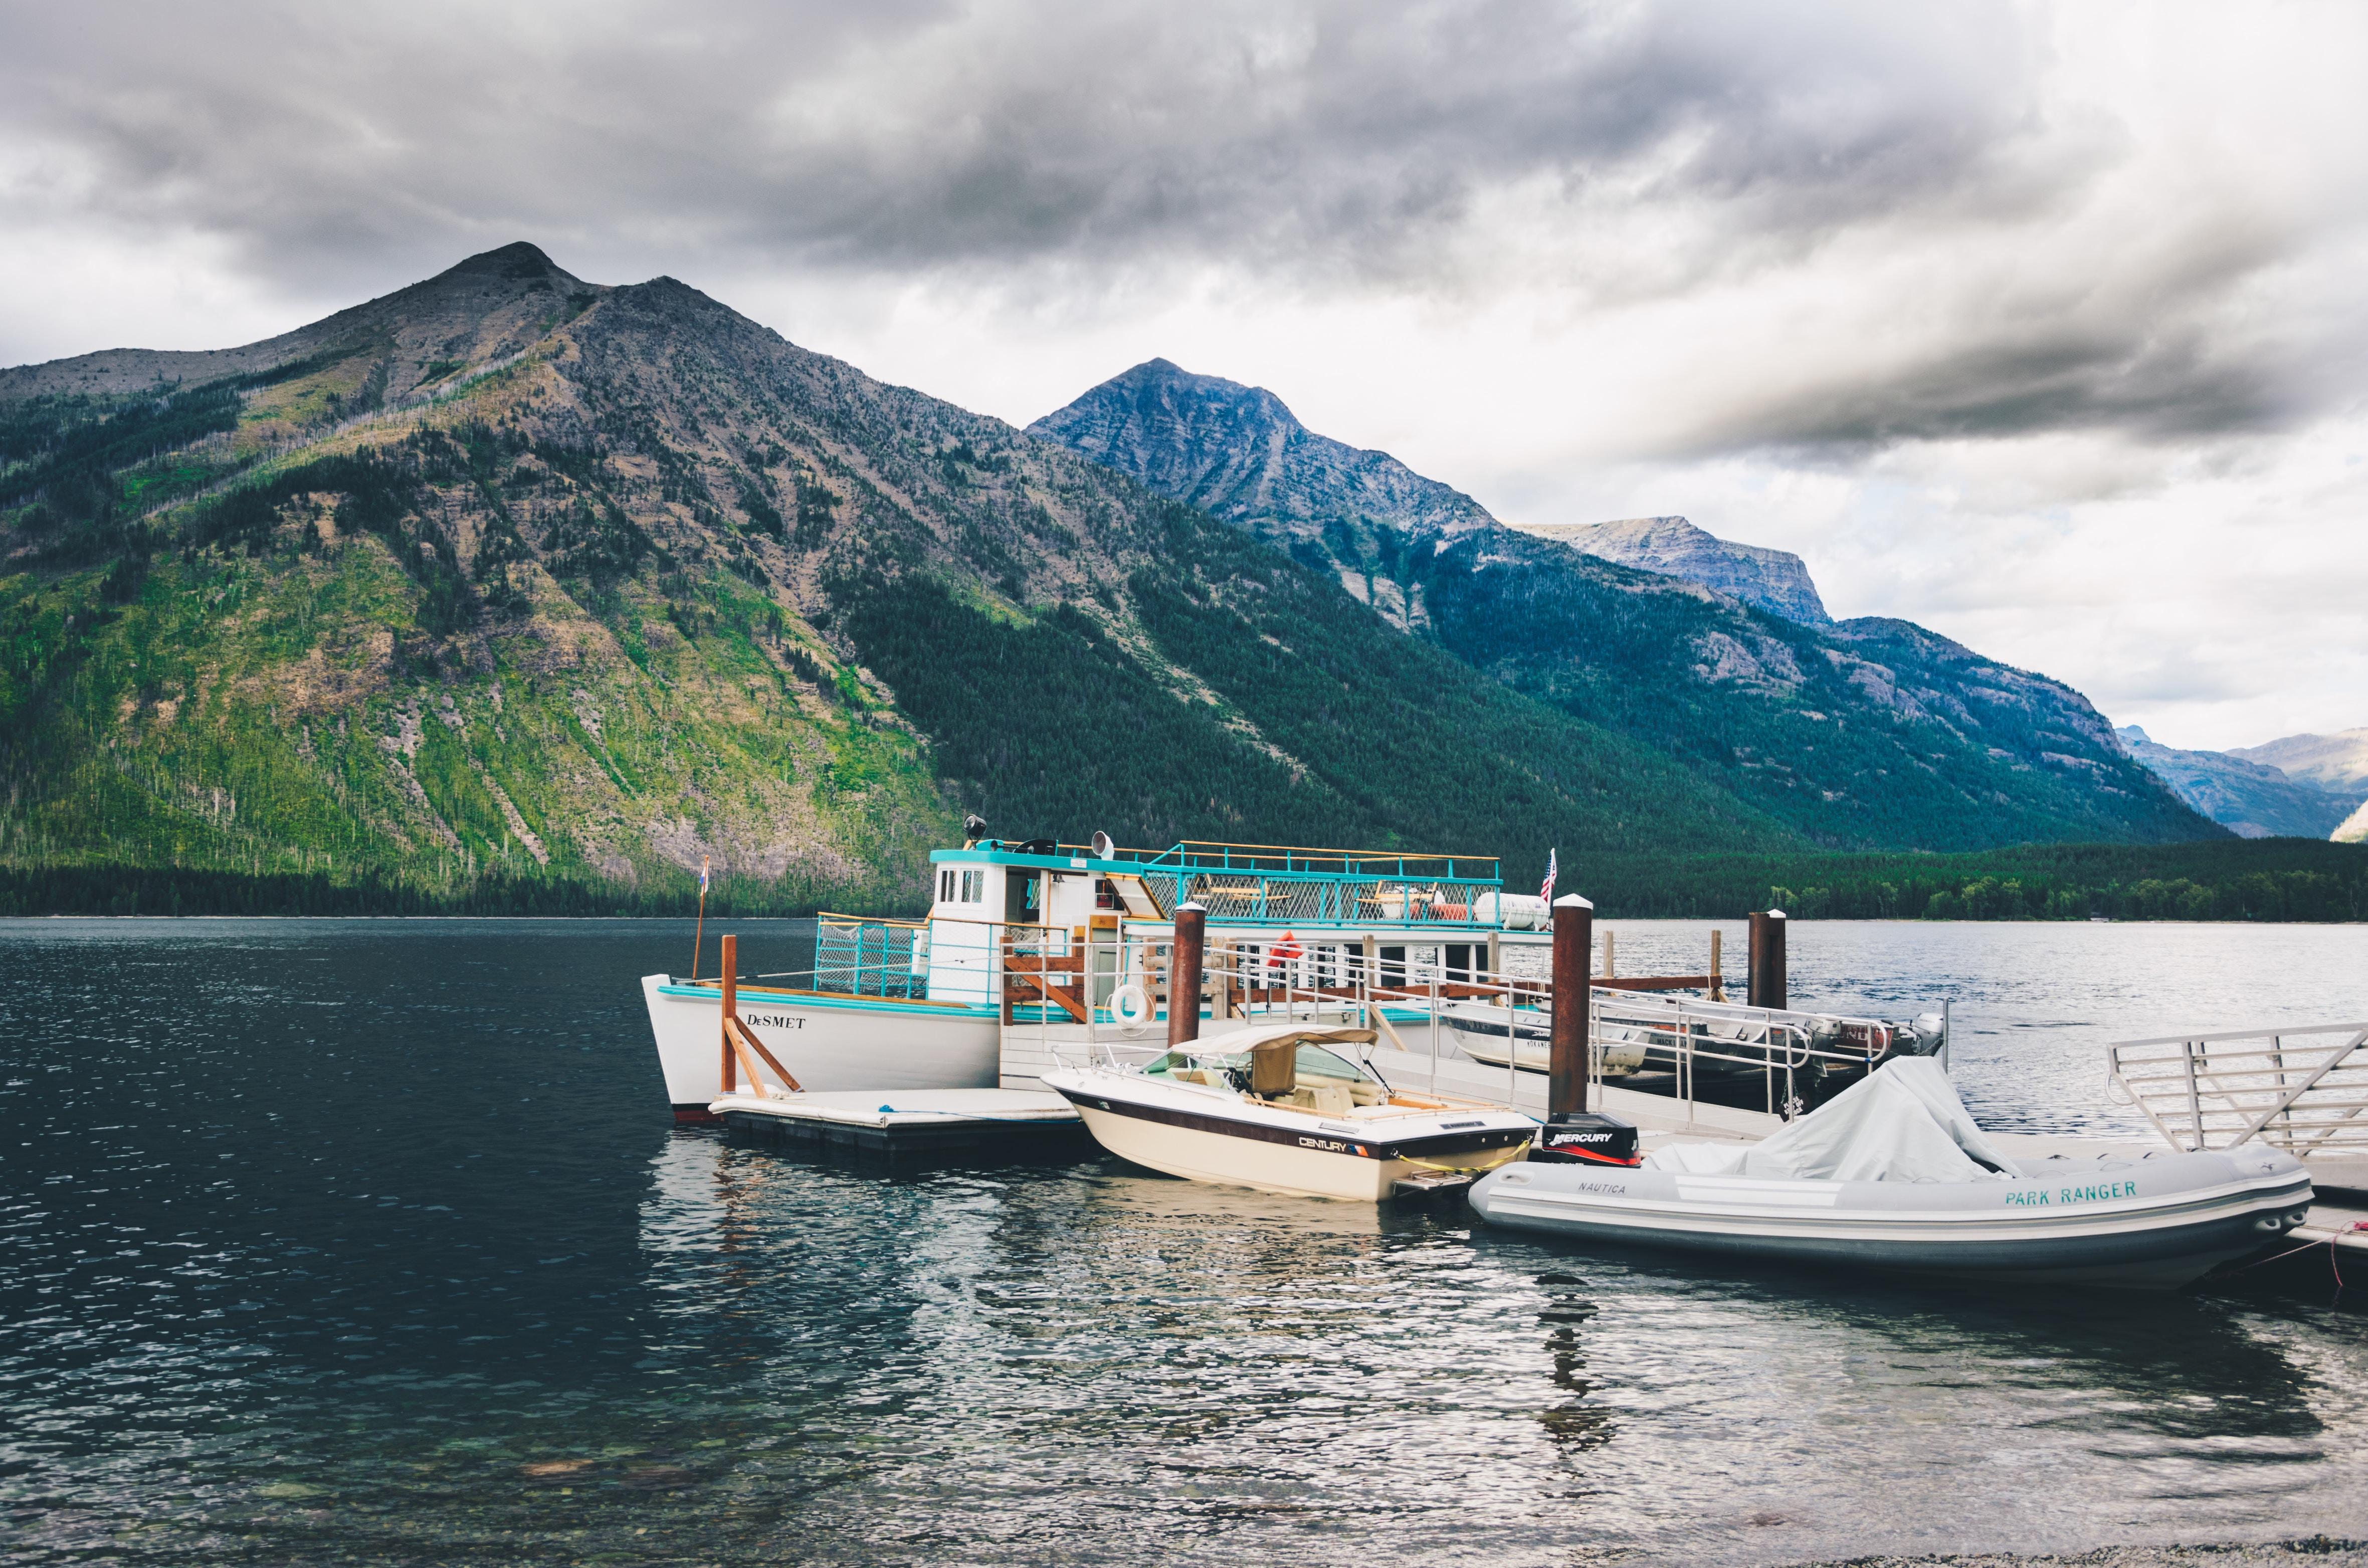 white motorboard docking on body of water